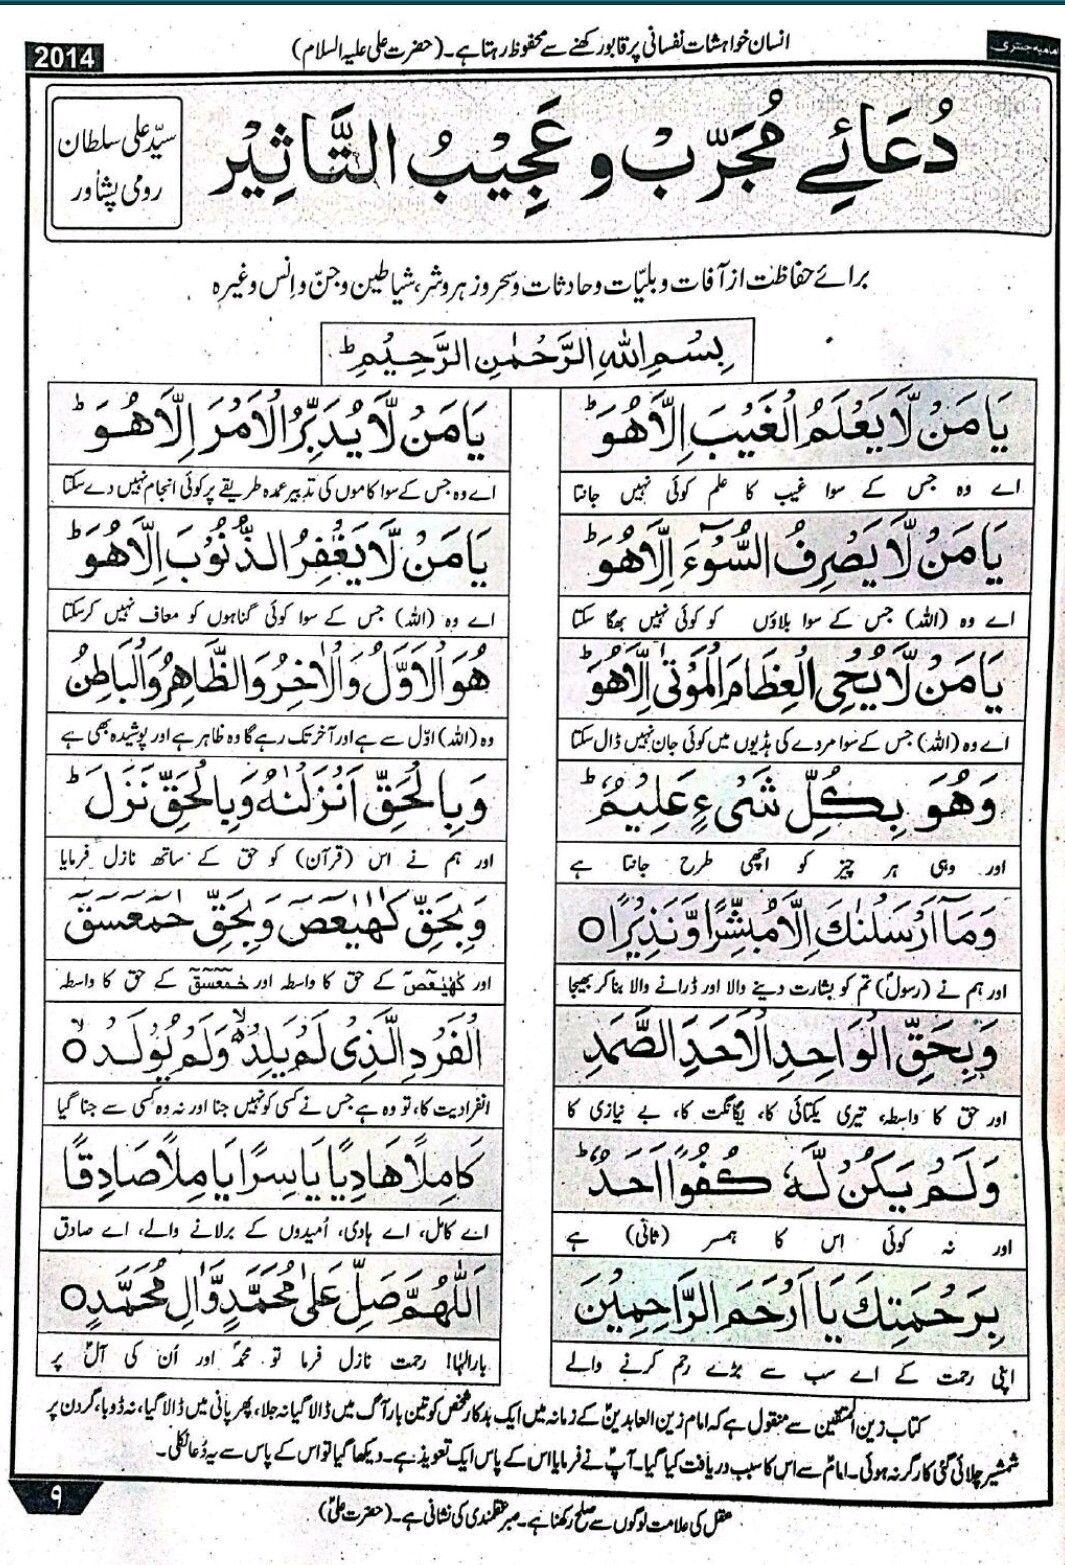 Lire Le Coran En Arabe Pdf : coran, arabe, Facebook, Islam, Facts,, Islamic, Phrases,, Quotes, Quran